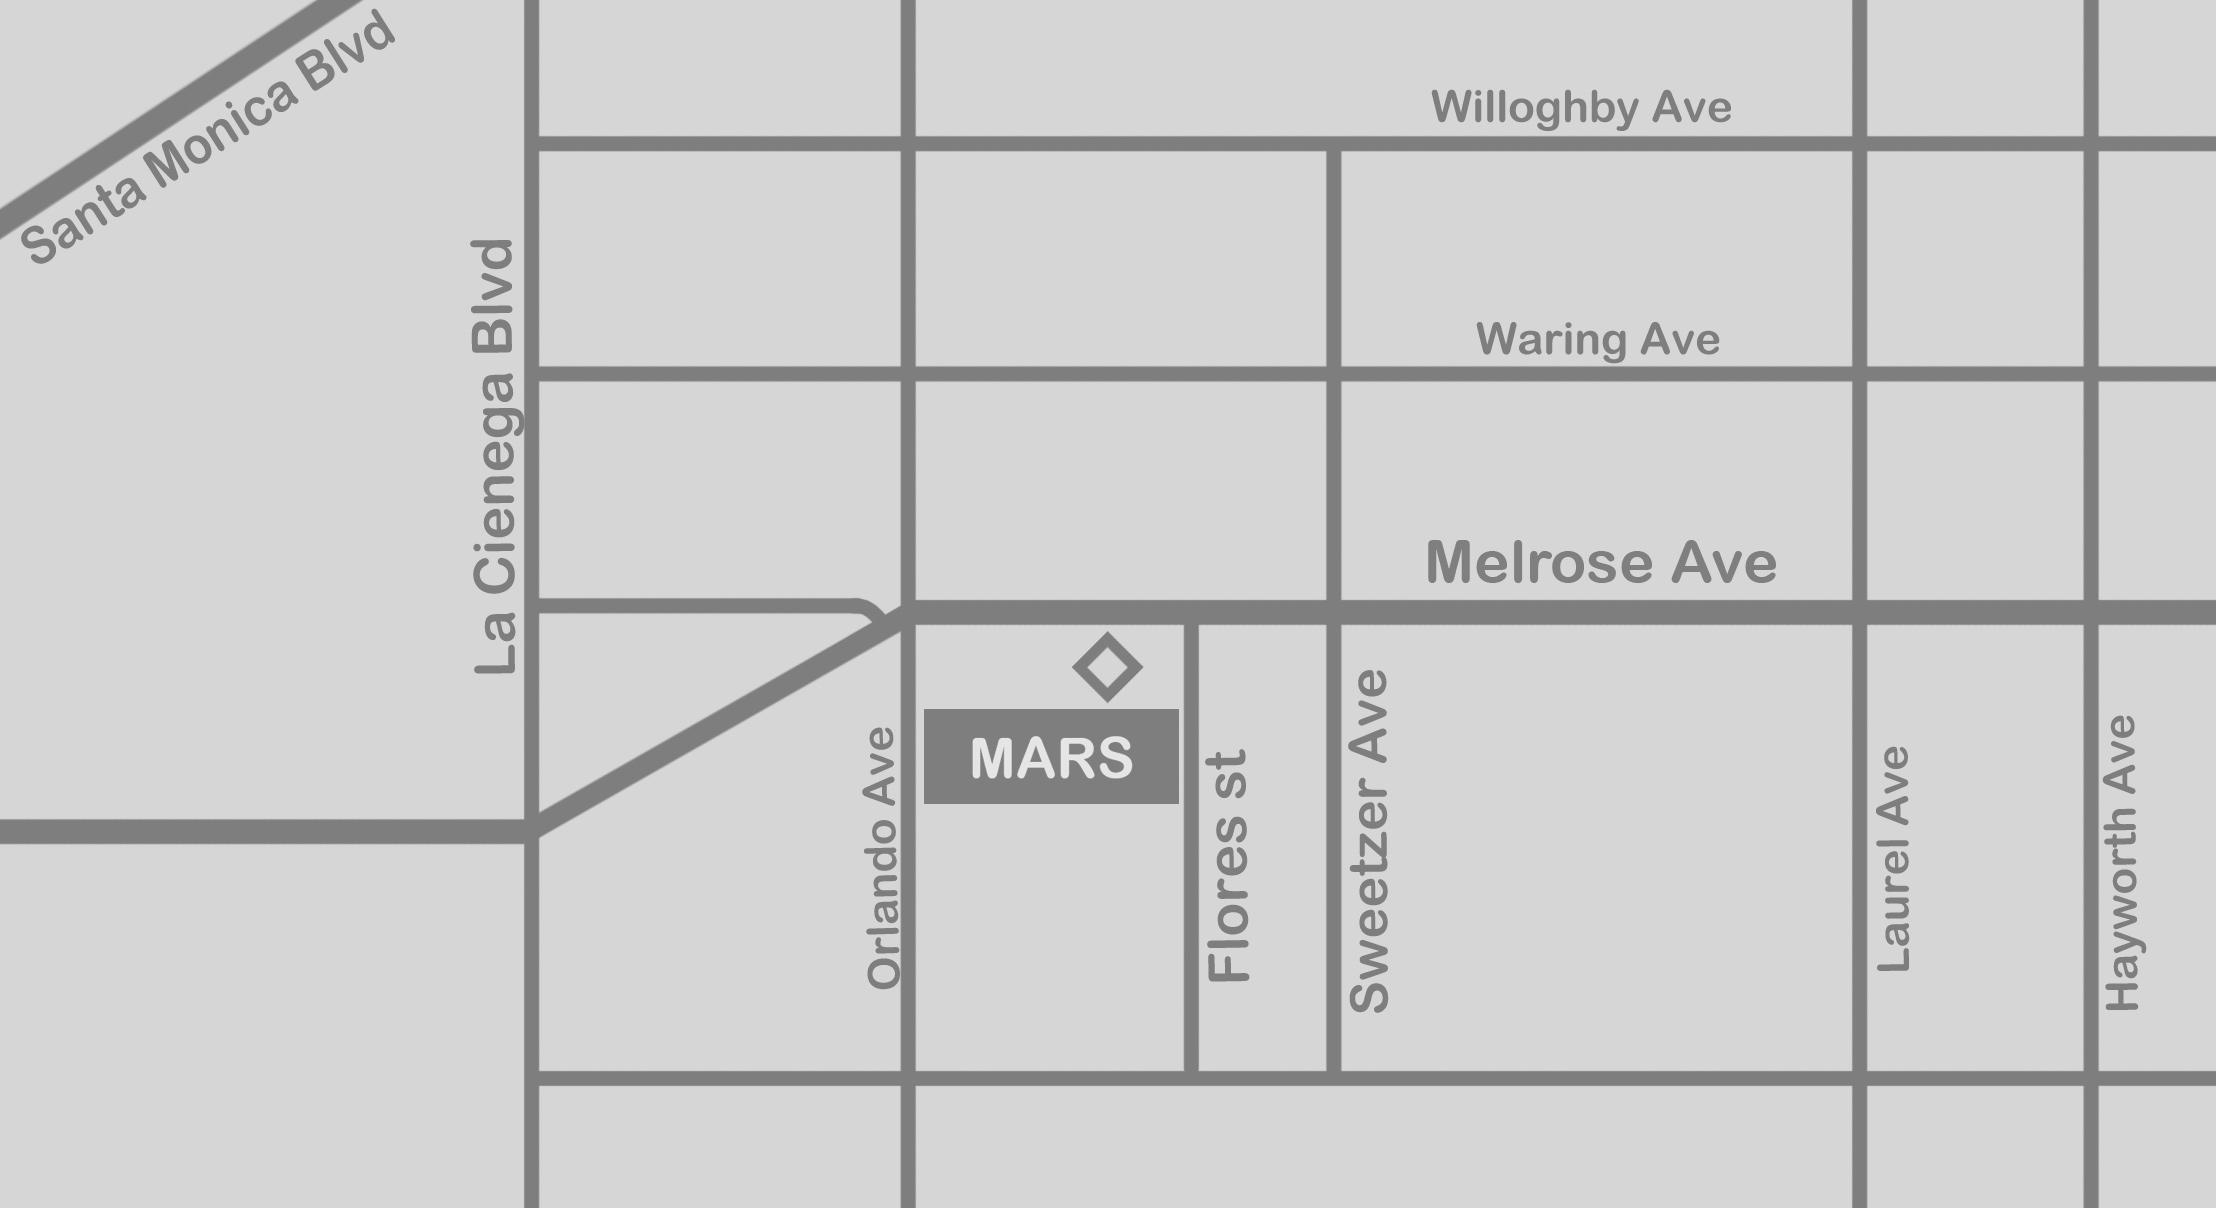 MARS_MAP02.jpg